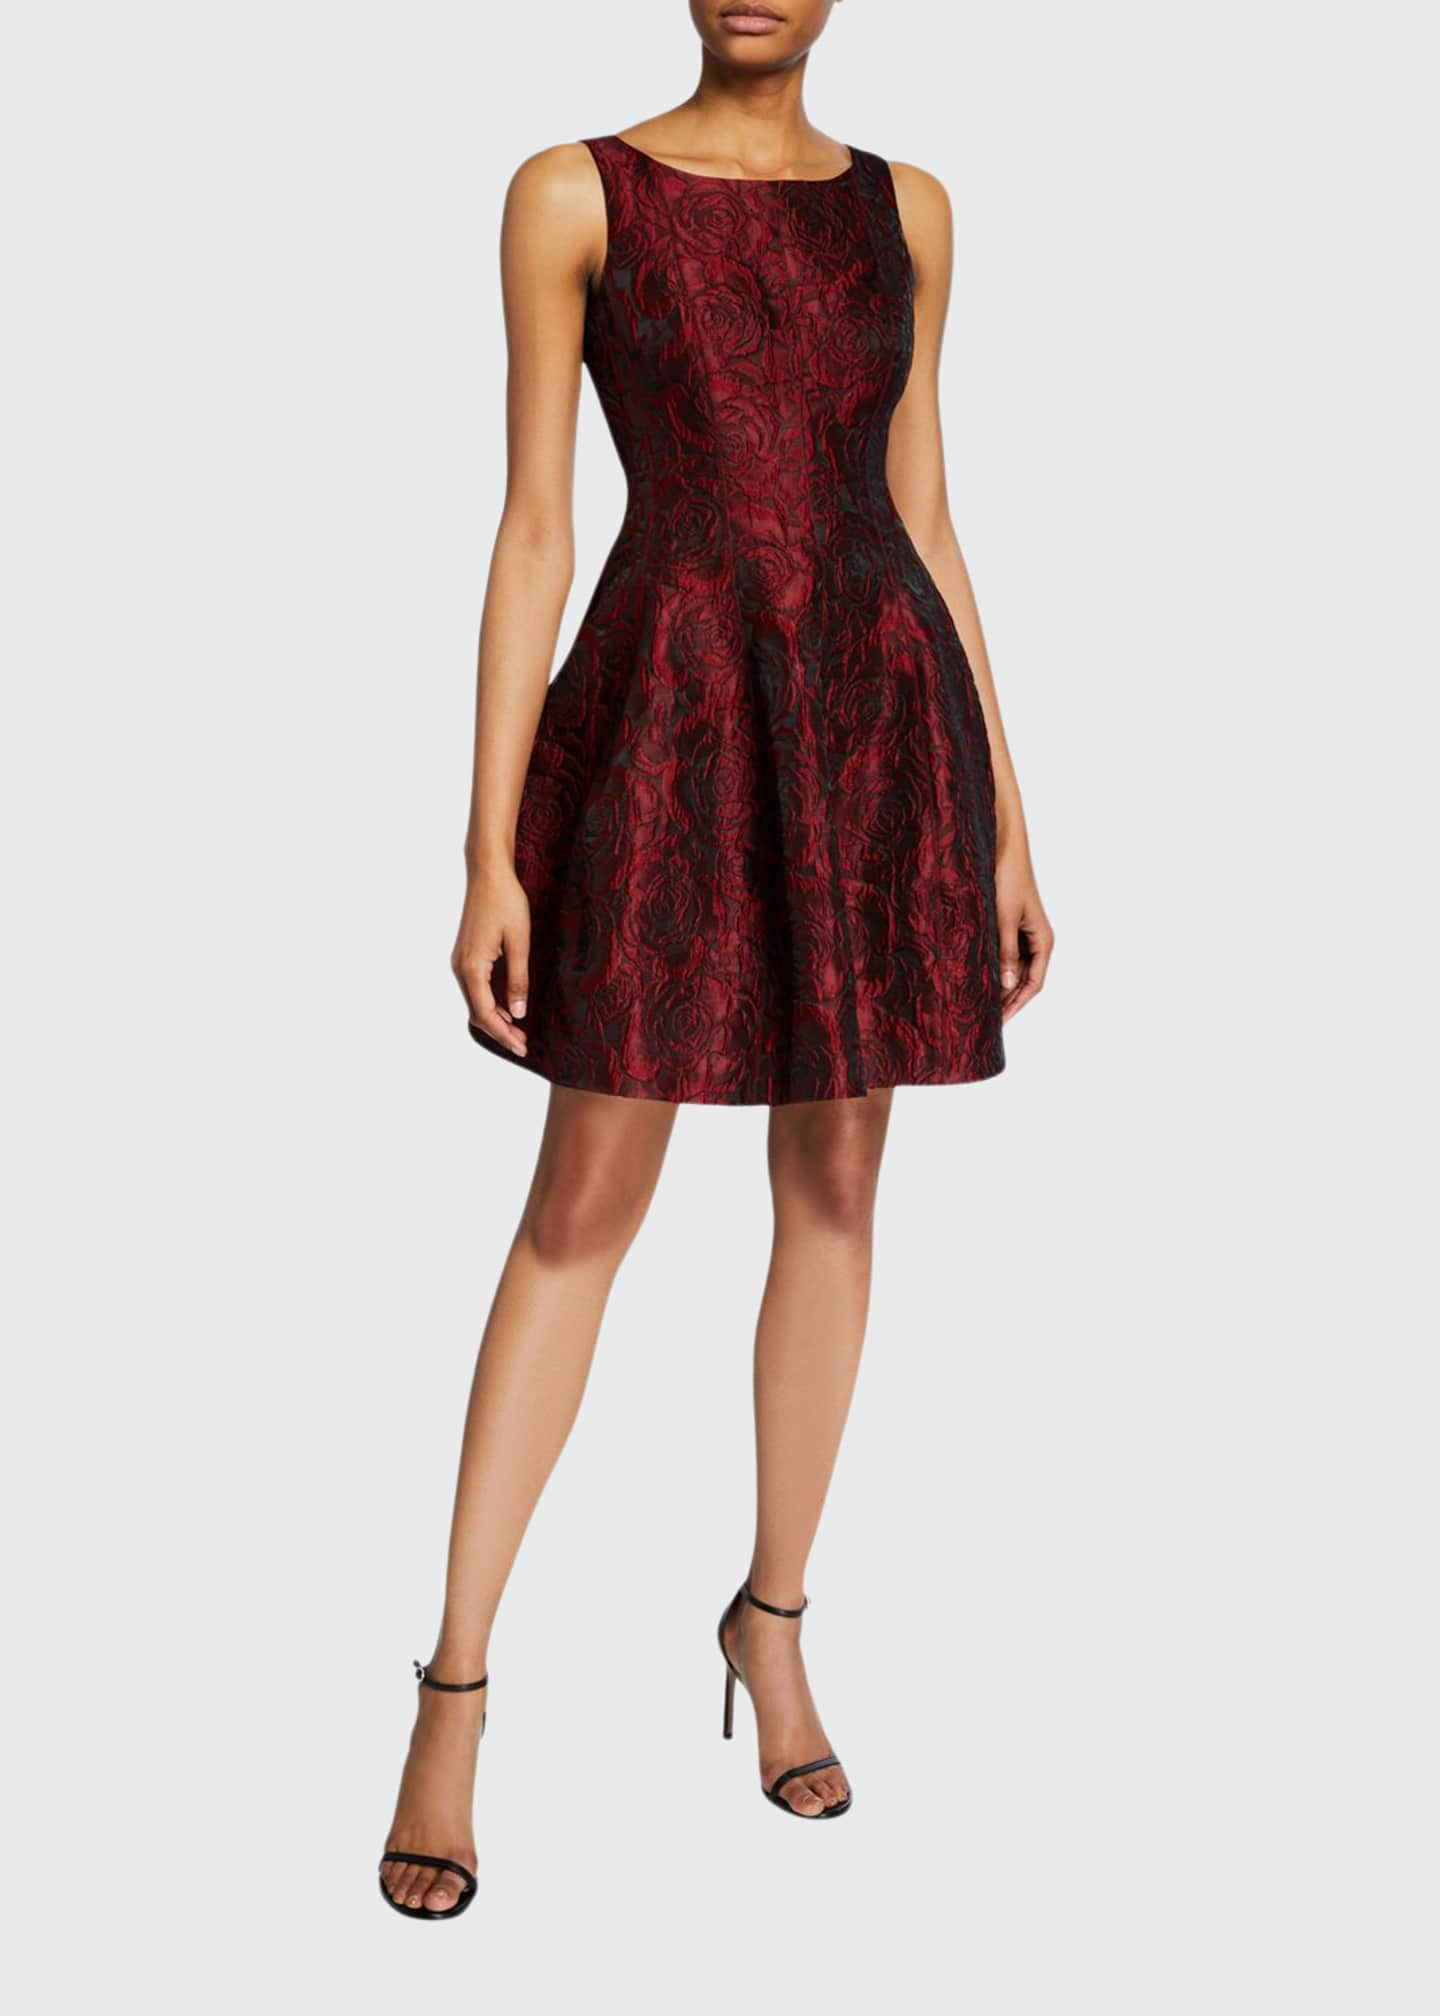 Halston Floral Jacquard Sleeveless Fit-&-Flare Dress